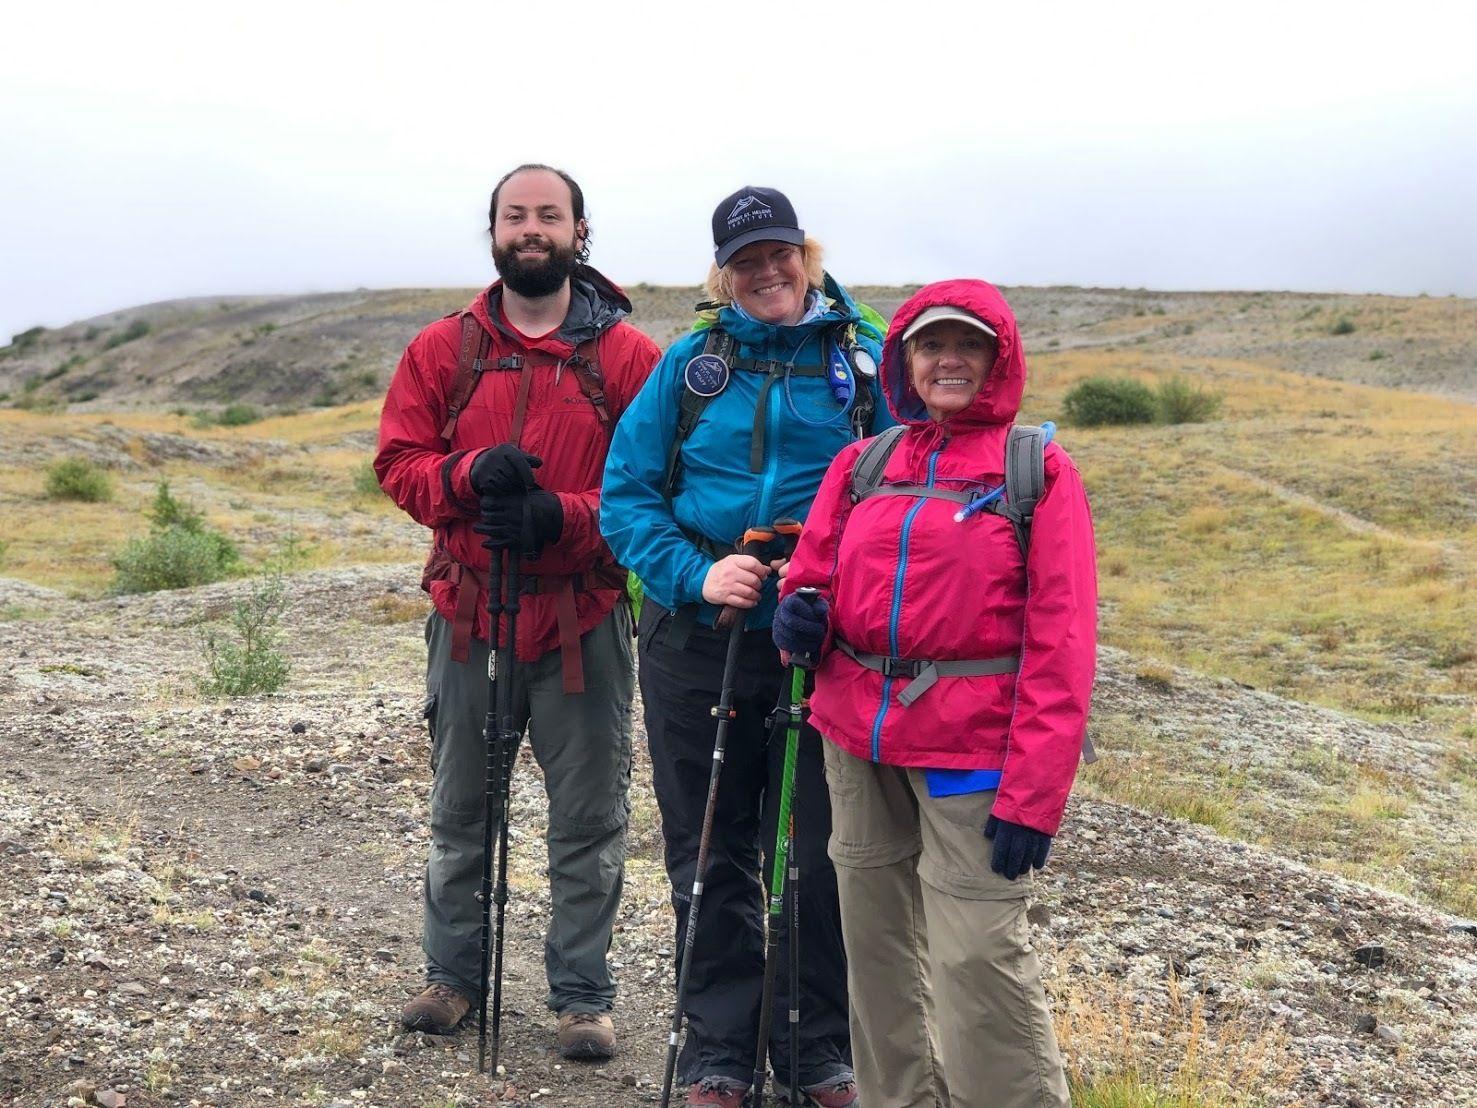 Glacier Overlook Hikes